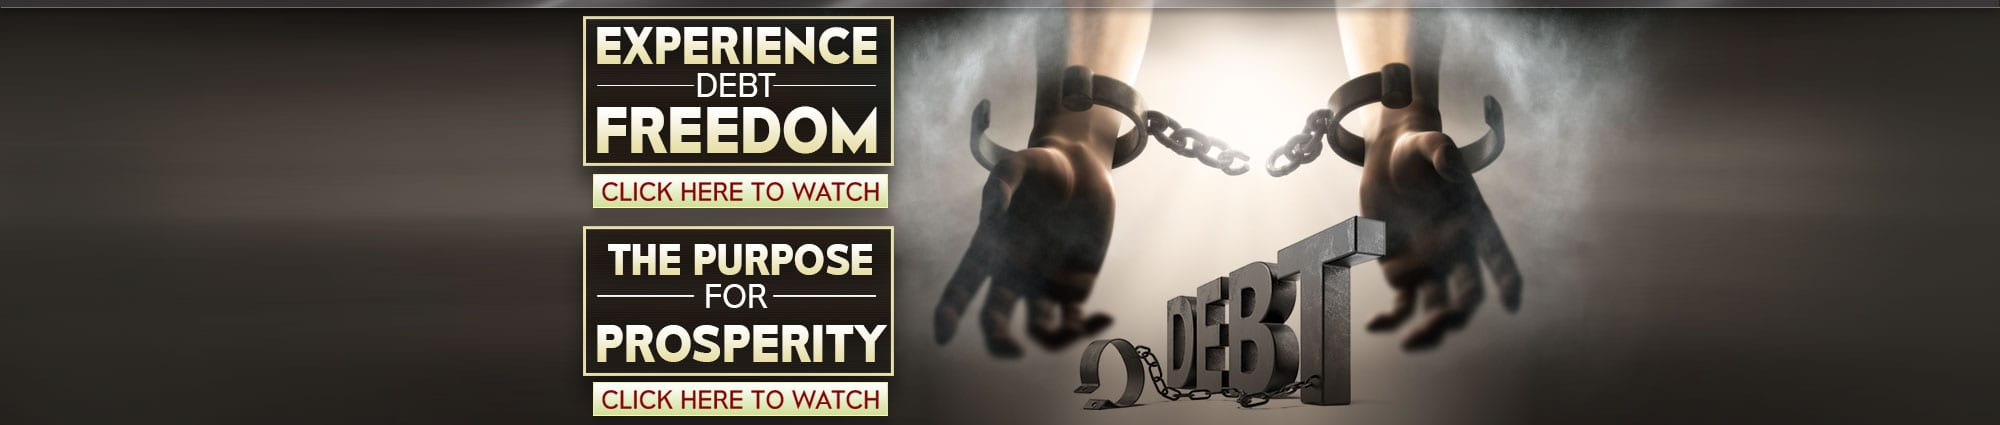 Experience Debt Freedom